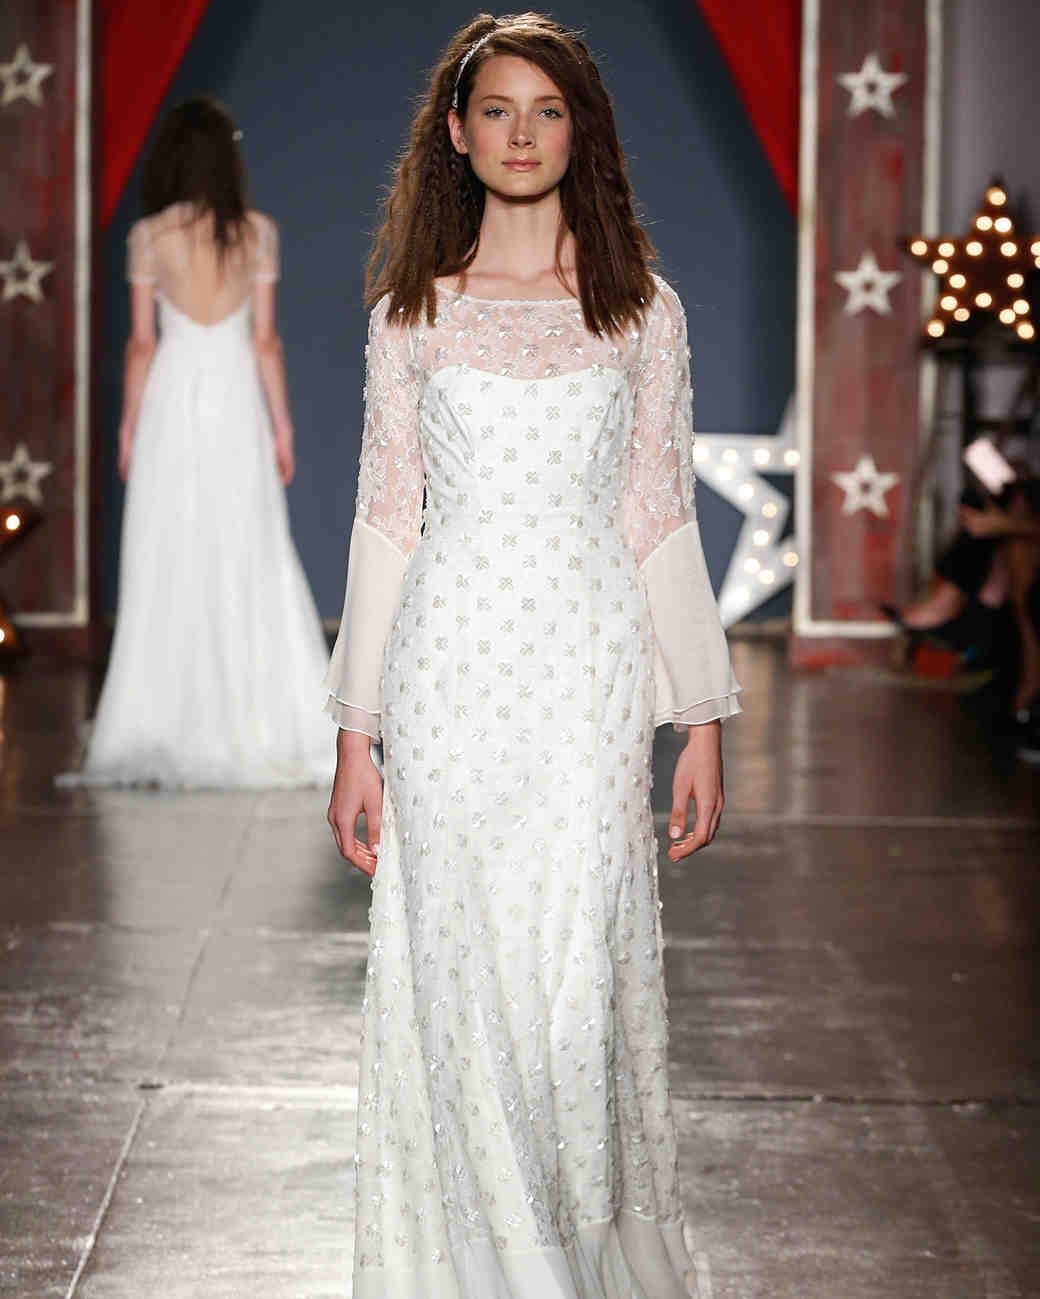 jenny packham wedding dress spring 2018 long-sleeve embroidered overlay